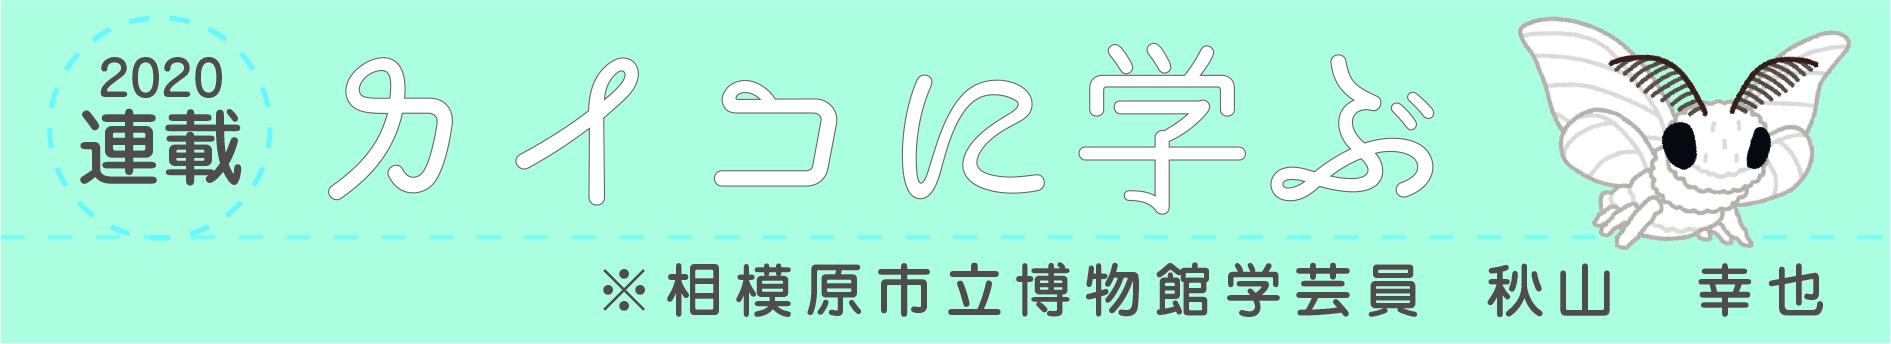 2020掲載 カイコに学ぶ ※相模原市立博物館学芸員 秋山幸也